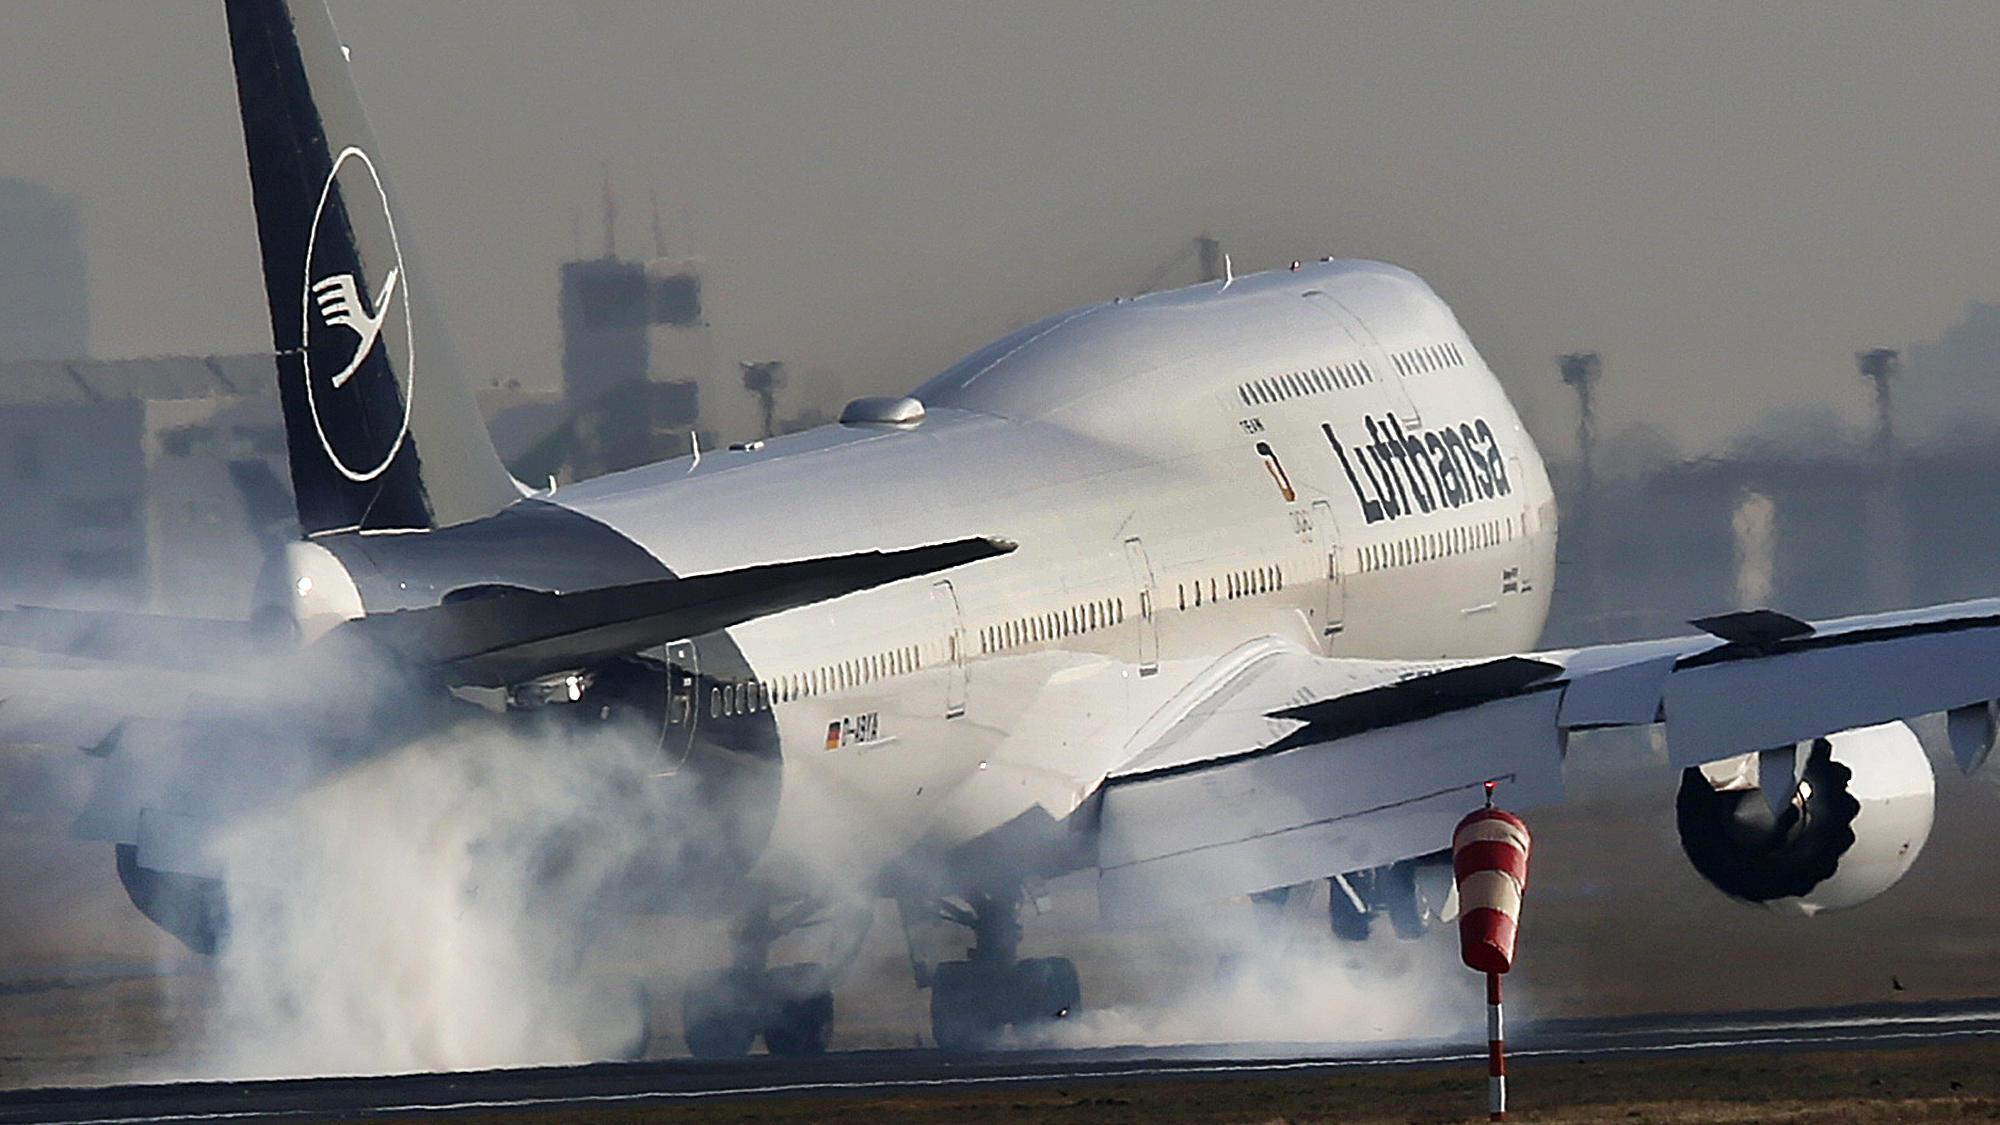 lufthansa airlines sues customer